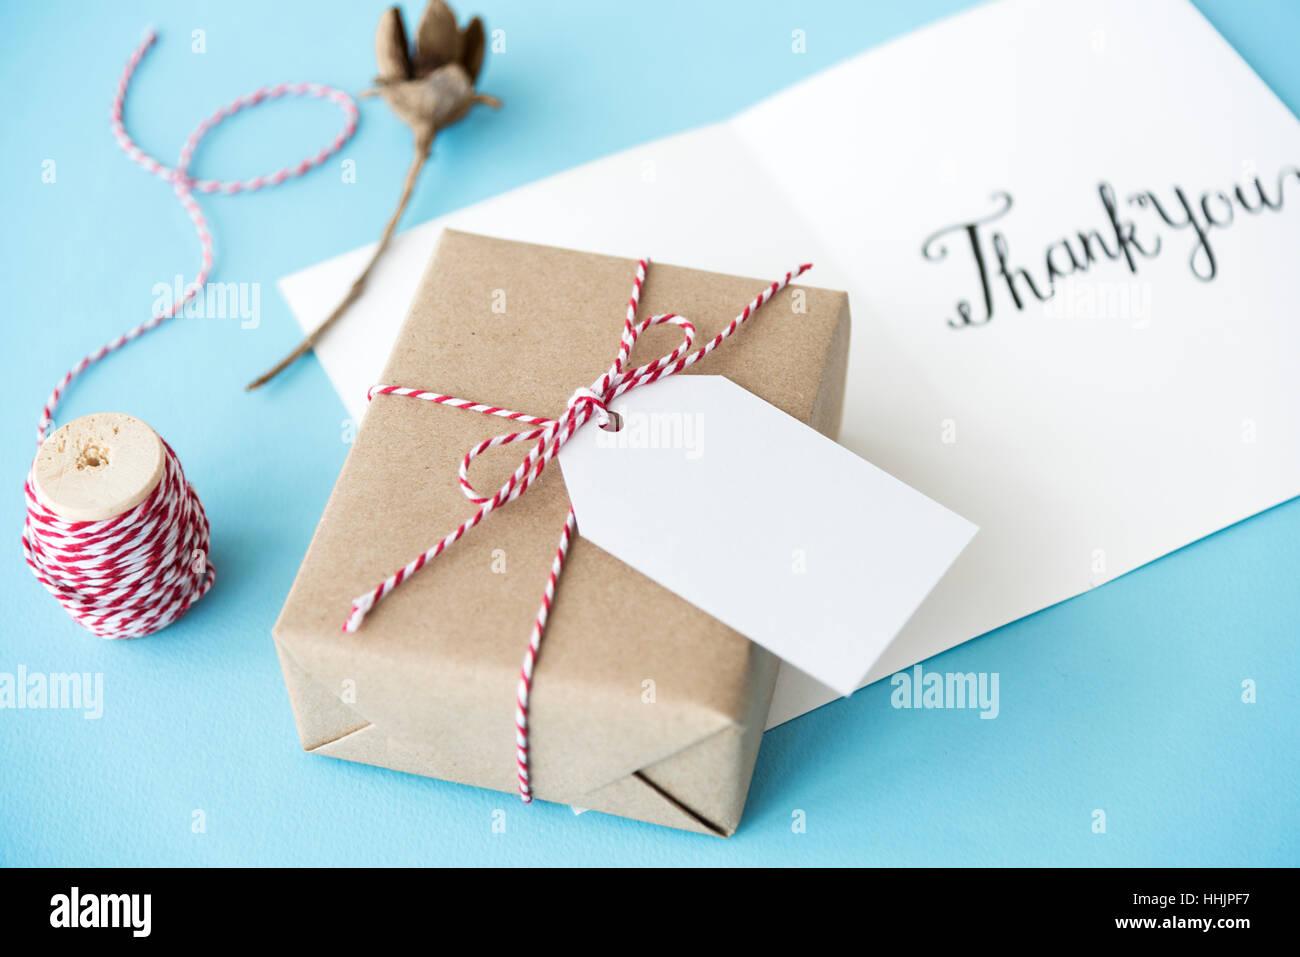 Thank You Gratitude Marci Gracias Danke Concept Stock Photo